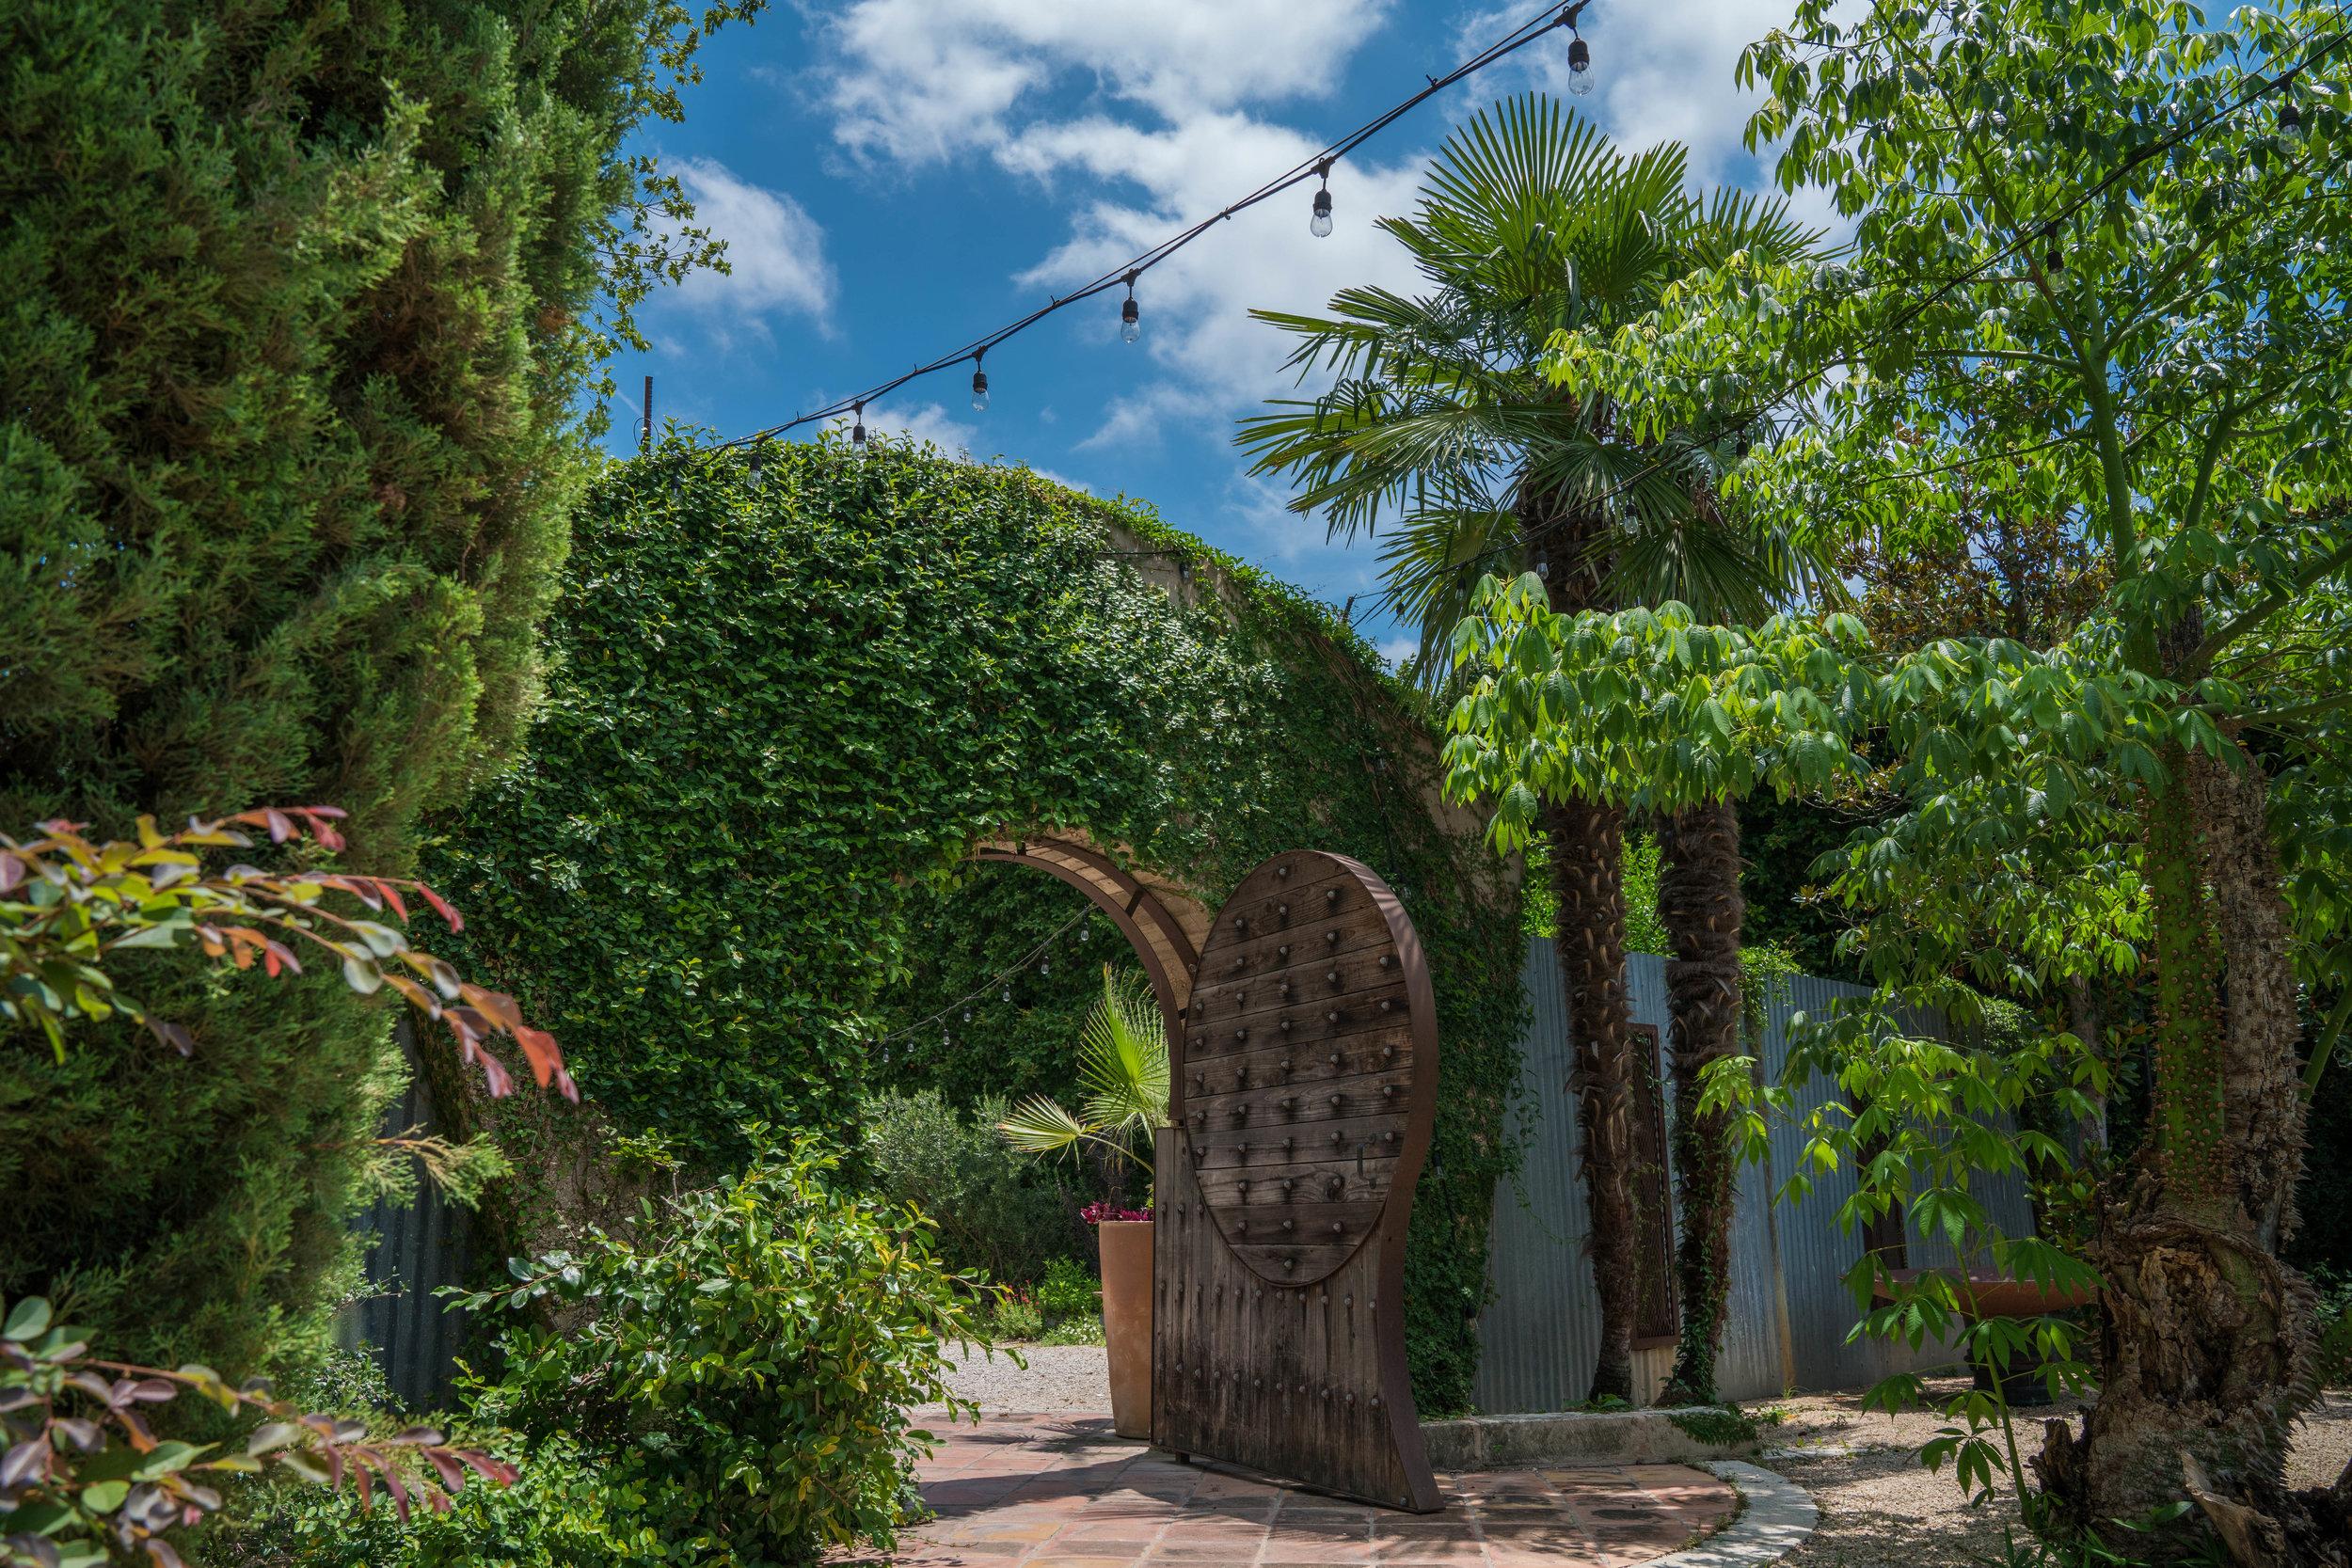 1102-East-Garden-June-2019-01481.jpg